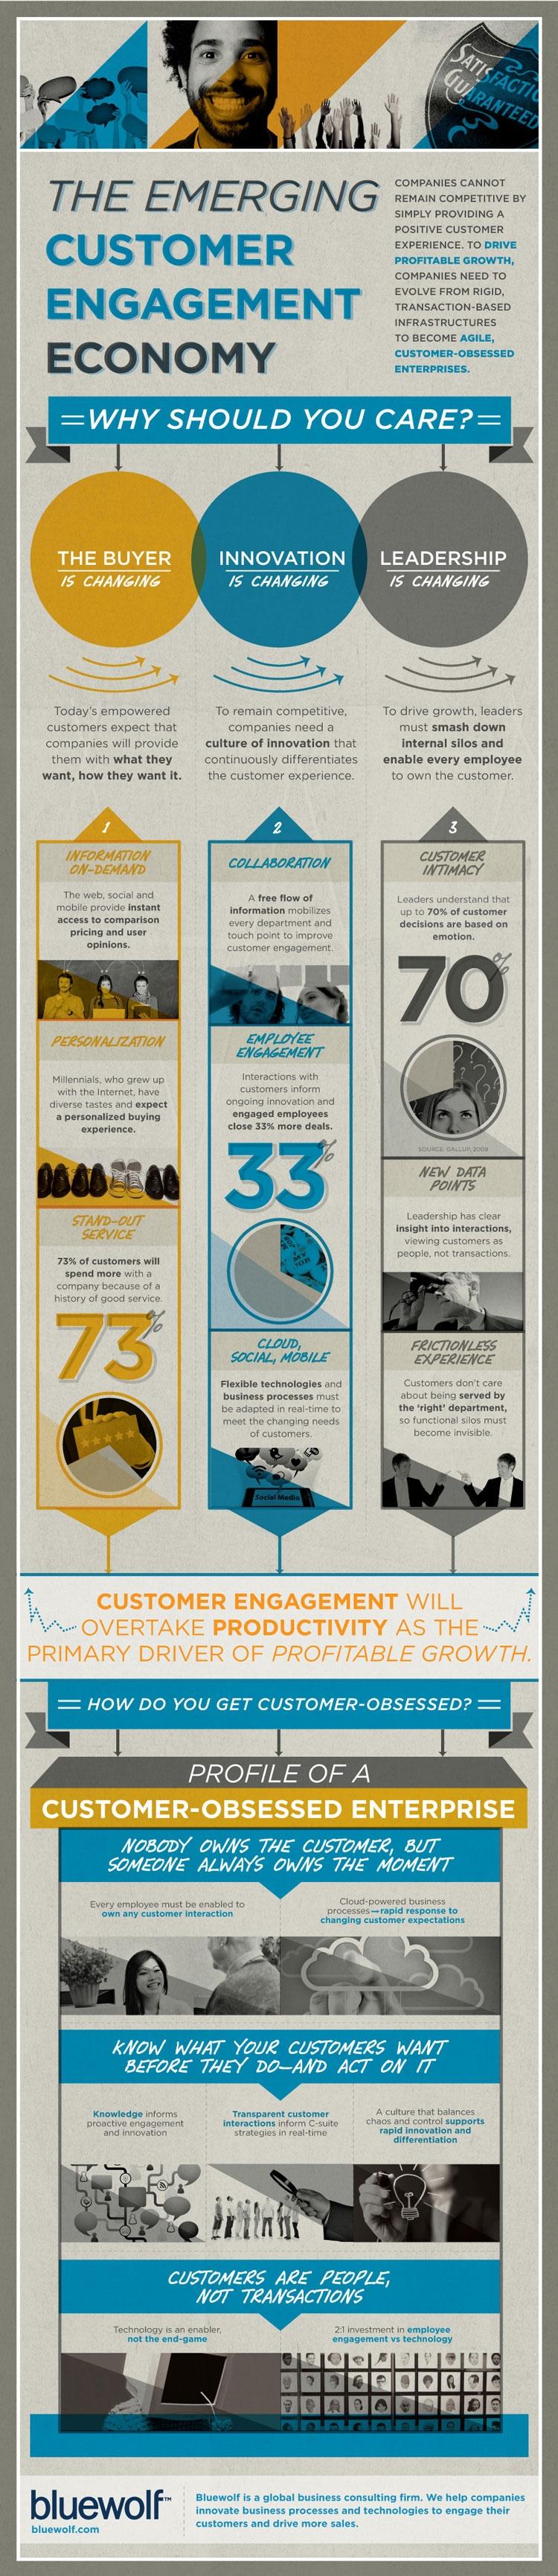 Bluewolf Emerging Customer Engagement infographic